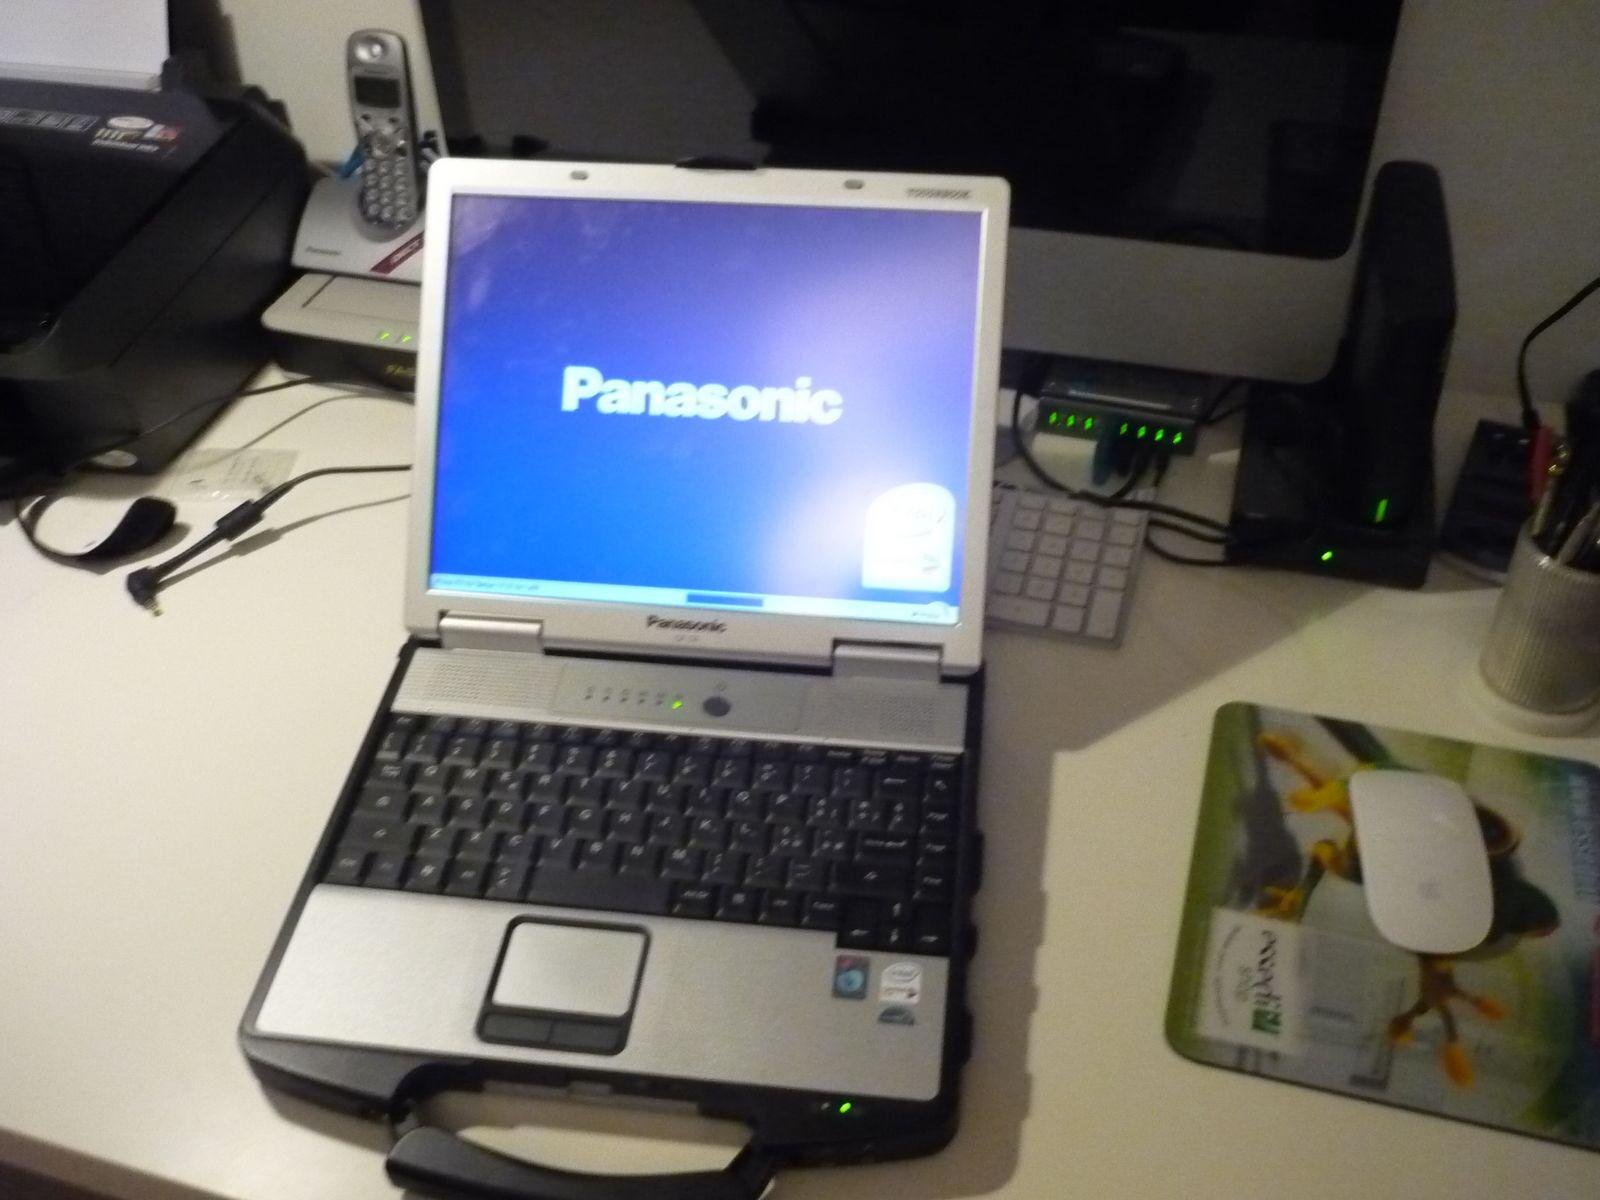 Panasonic Toughbook Cf-74 2.0ghz C2D 4gb 1tb Win XP Wifi TOUCHSCREEN Serial Port